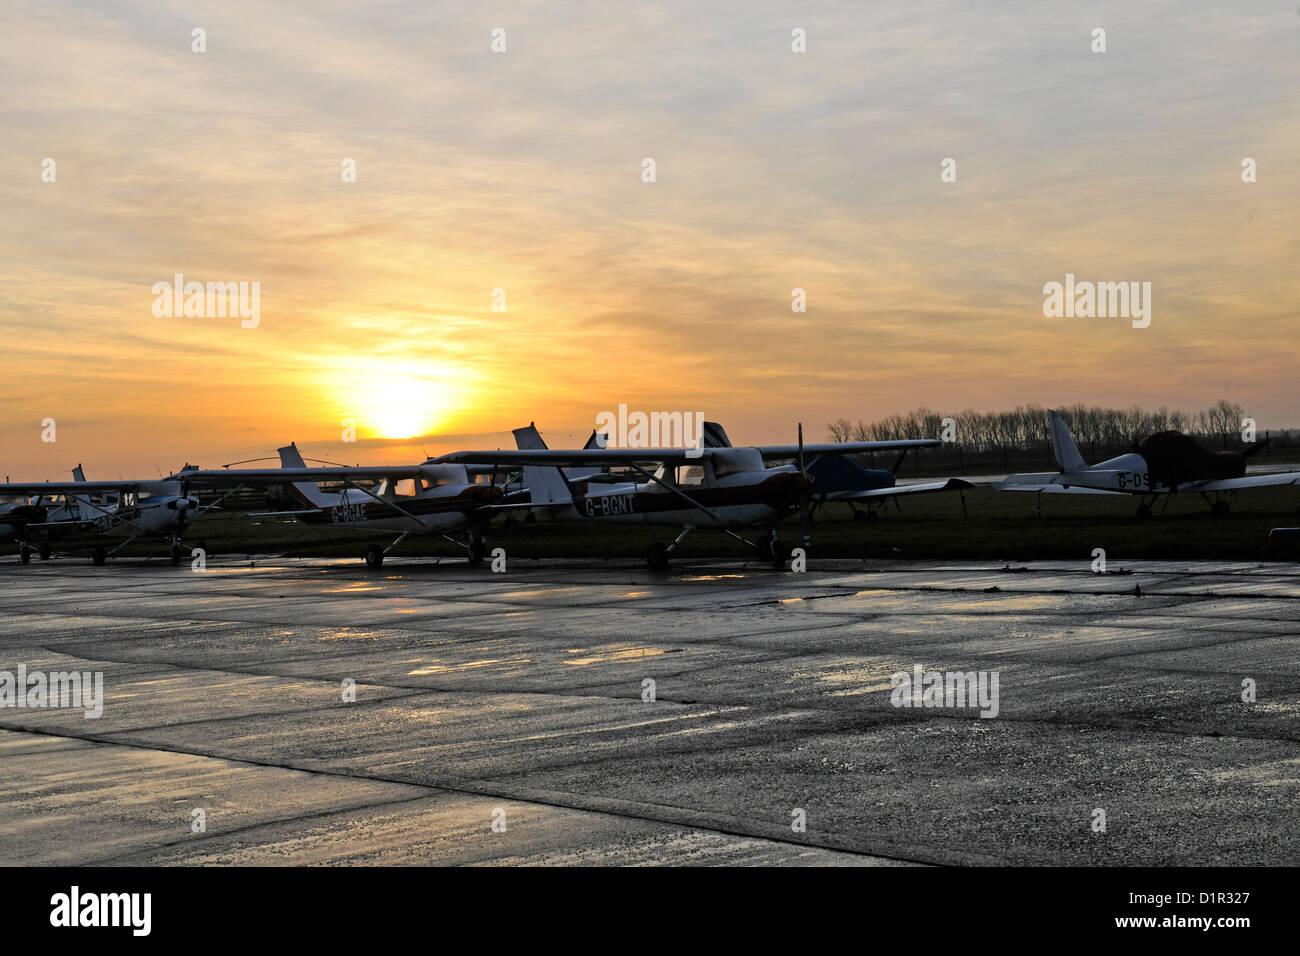 Photo of light aircraft at Peterborough Conington airport at dawn - Stock Image